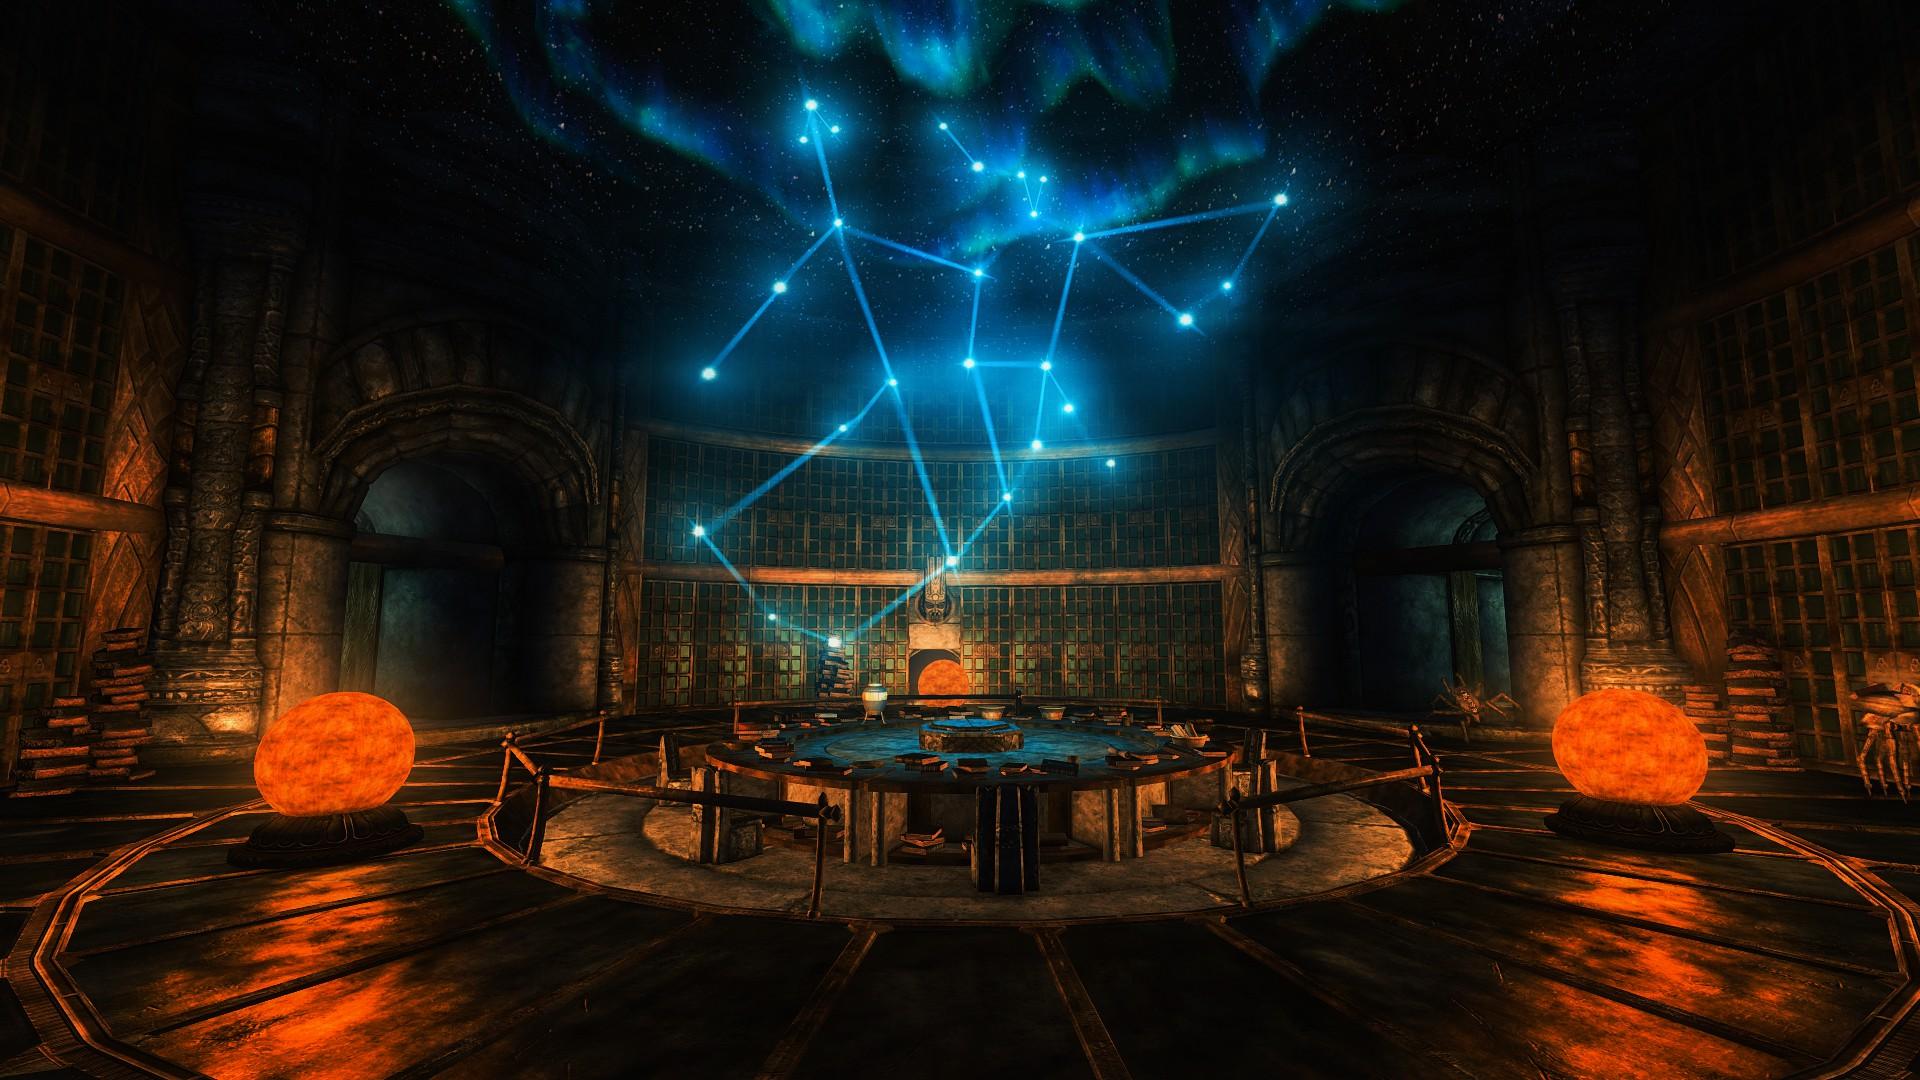 Skyrim: Project AHO - Elder Scrolls 5: Skyrim, the